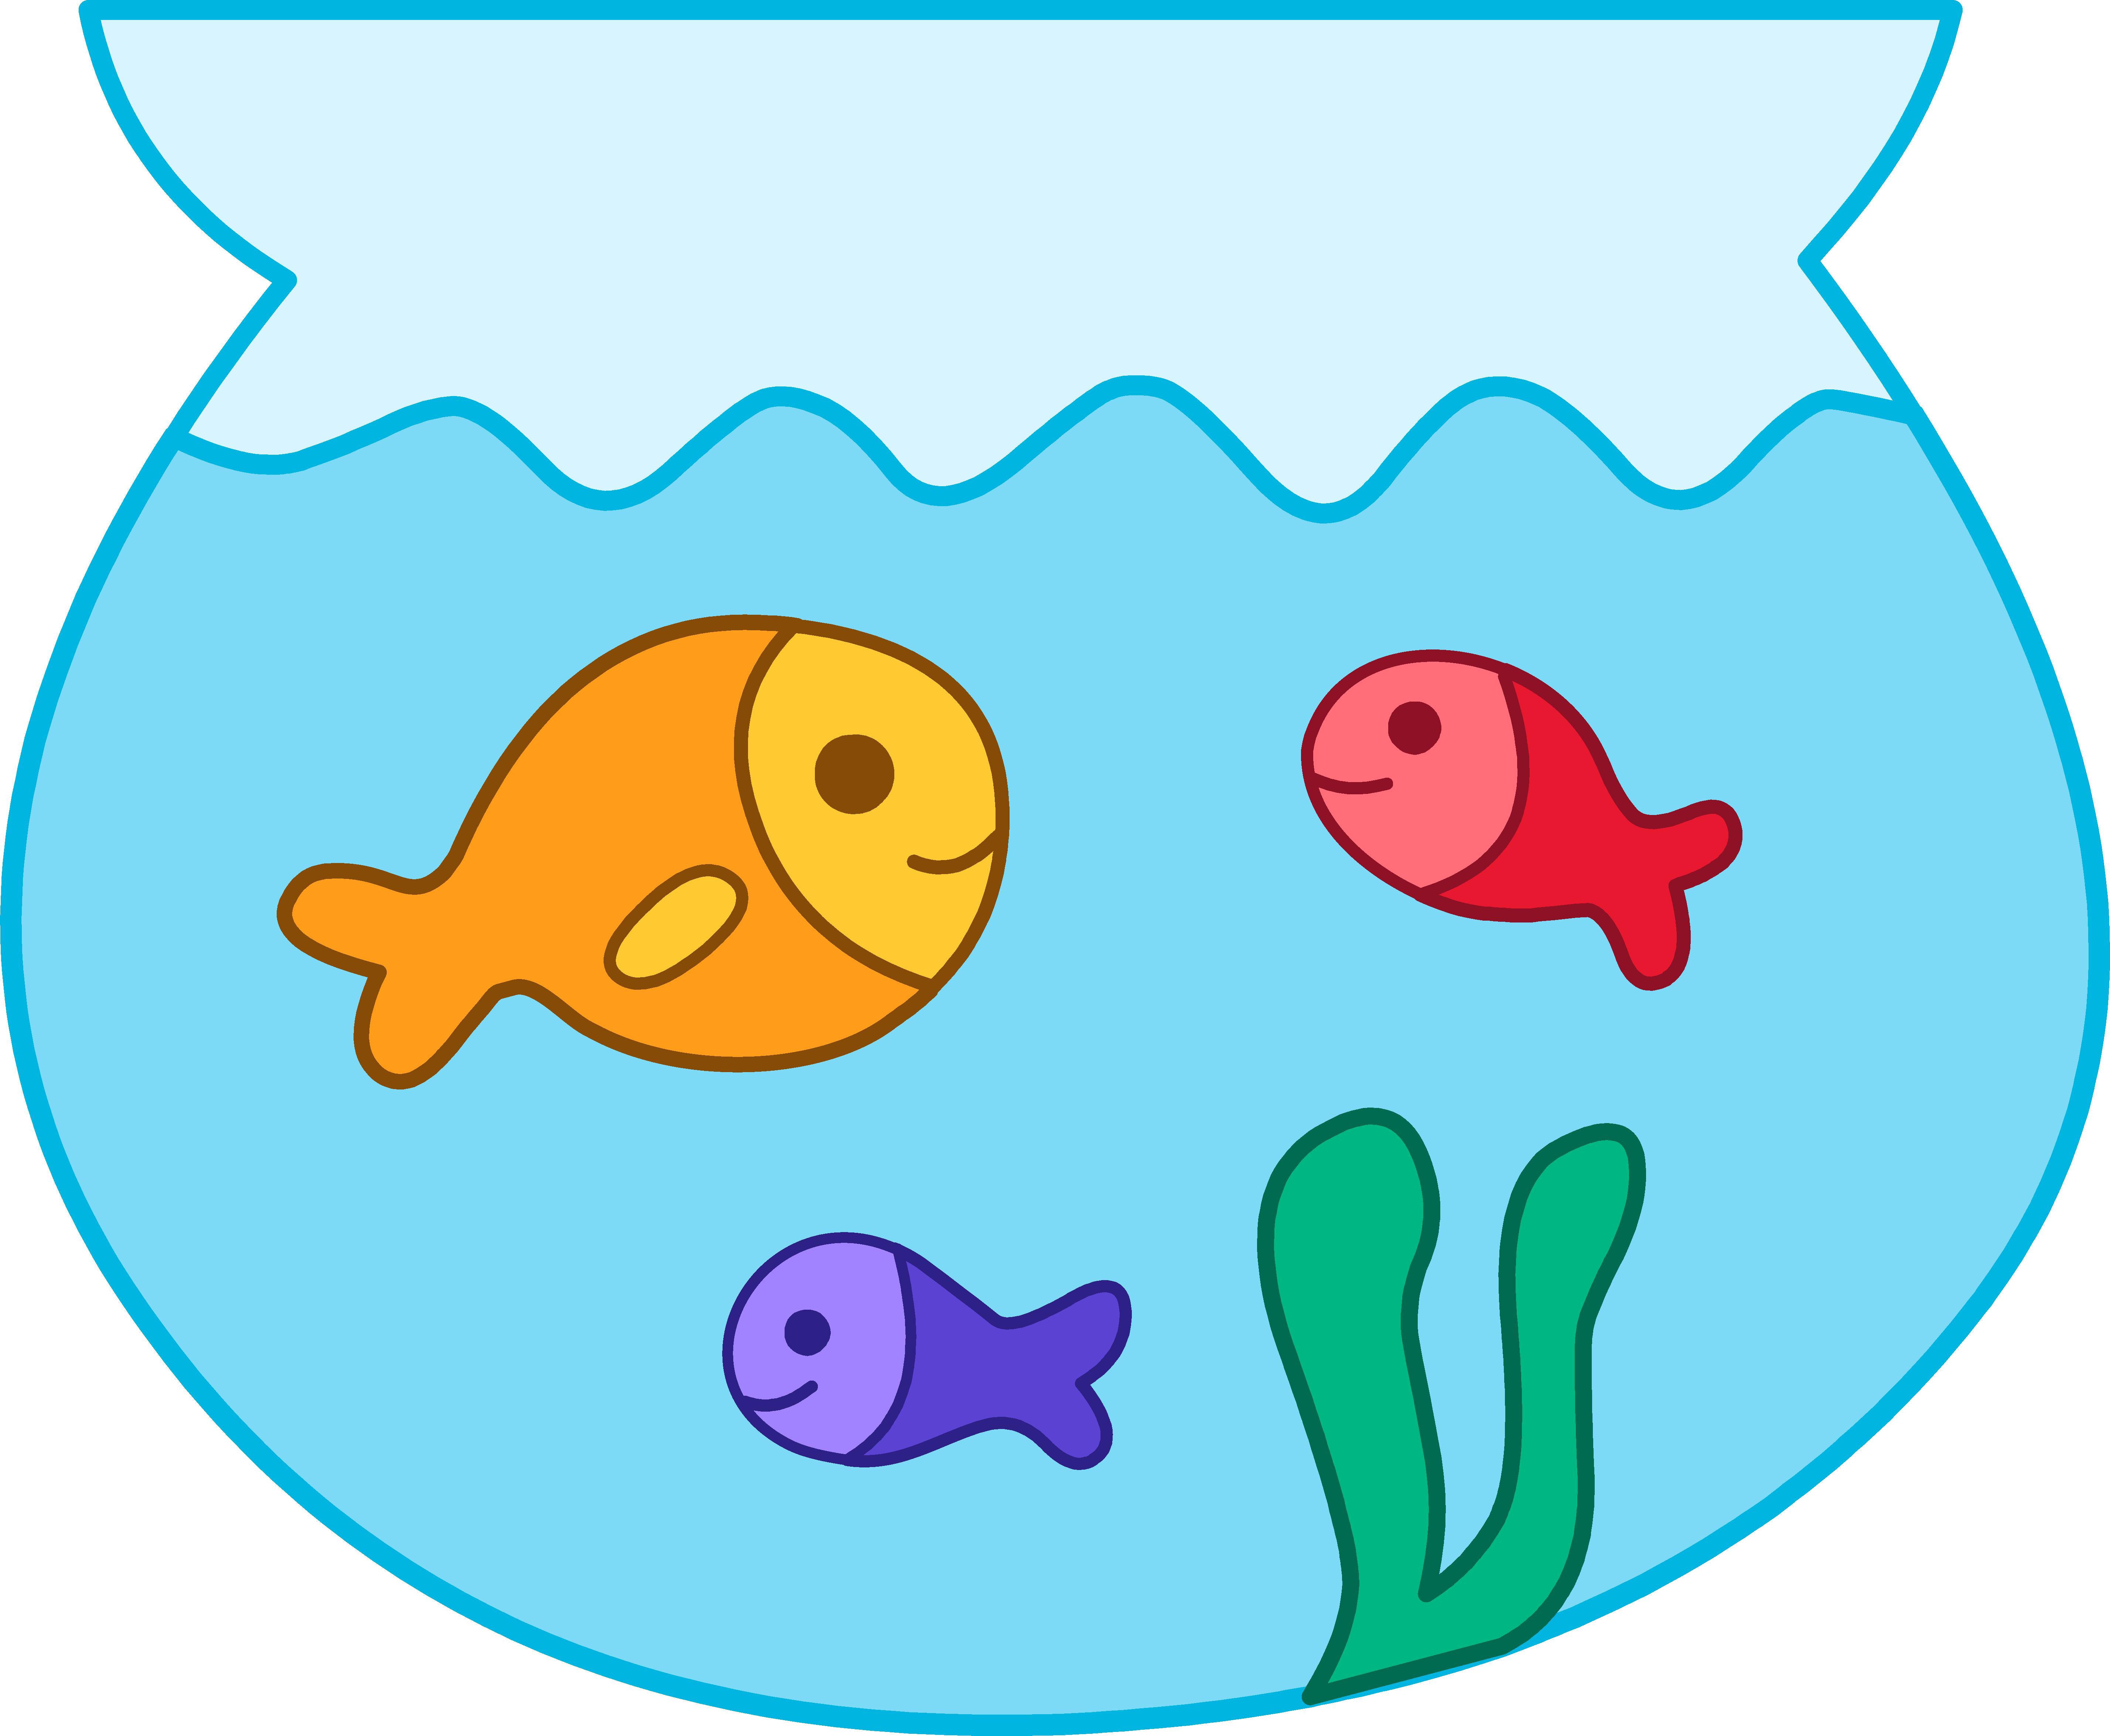 Fish bowl clipart free. Fishbowl cliparts download clip